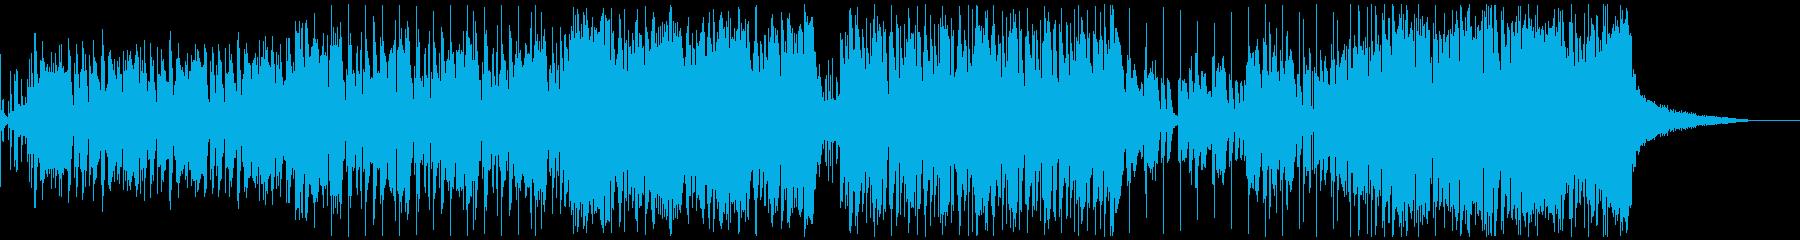 EDM・トロピカルハウス アコギ収録の再生済みの波形